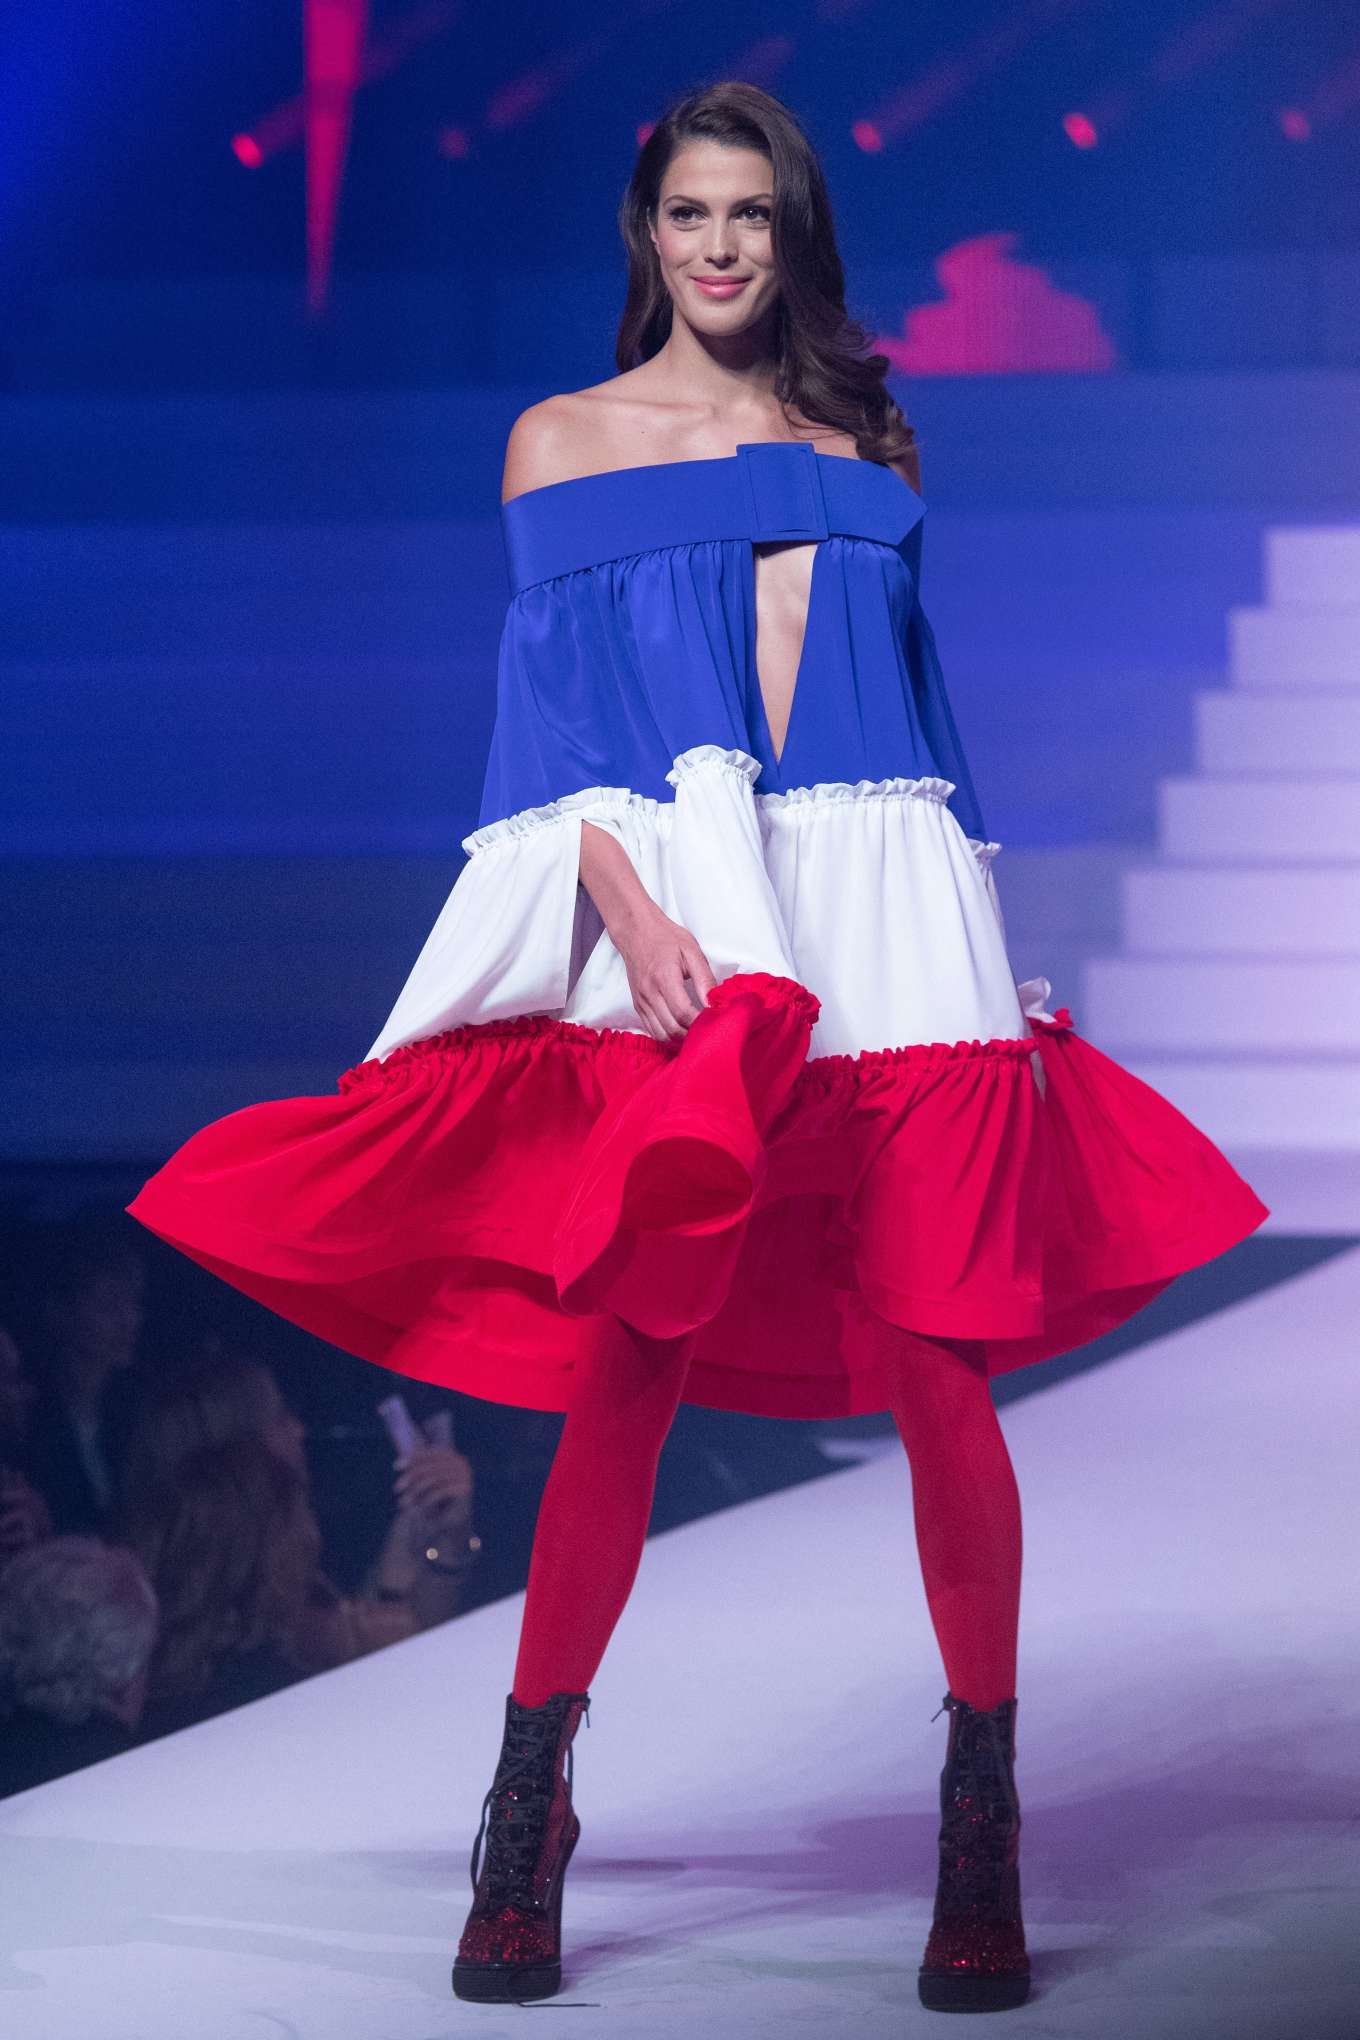 Iris Mittenaere 2020 : Iris Mittenaere – Jean-Paul Gaultier Runway Show in Paris-11